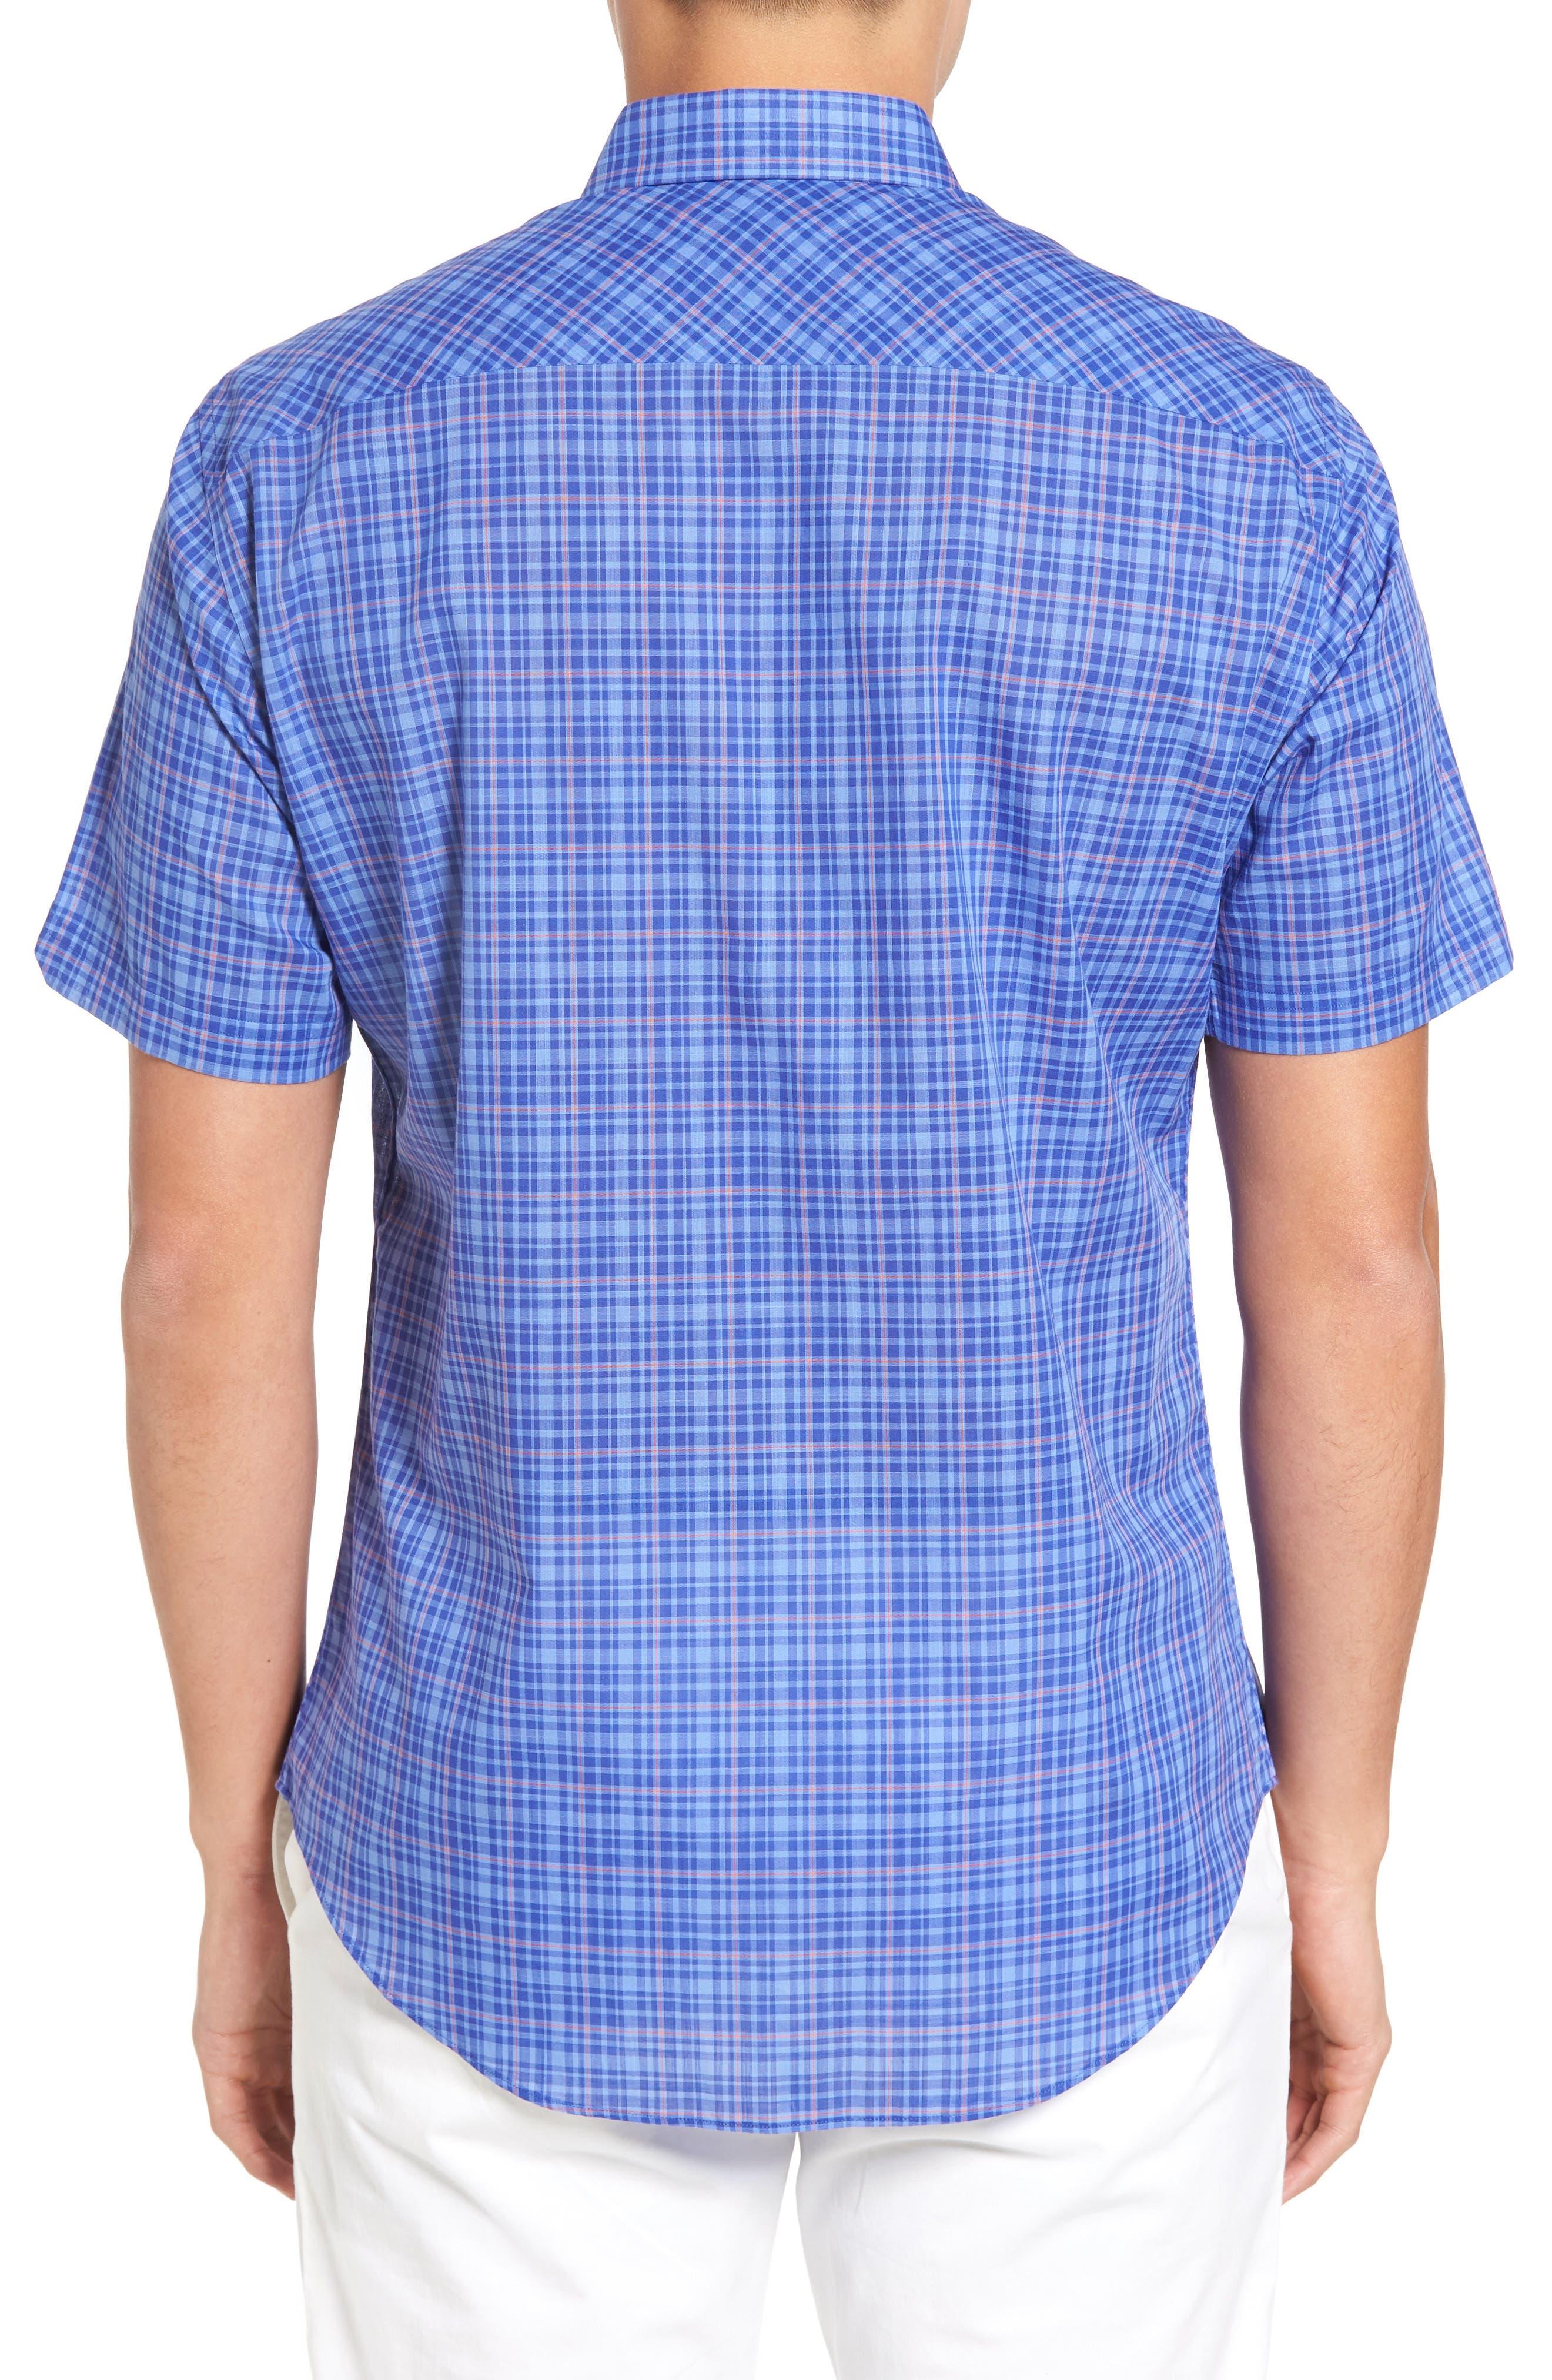 ZACHARY PRELL,                             Shammas Plaid Sport Shirt,                             Alternate thumbnail 2, color,                             432